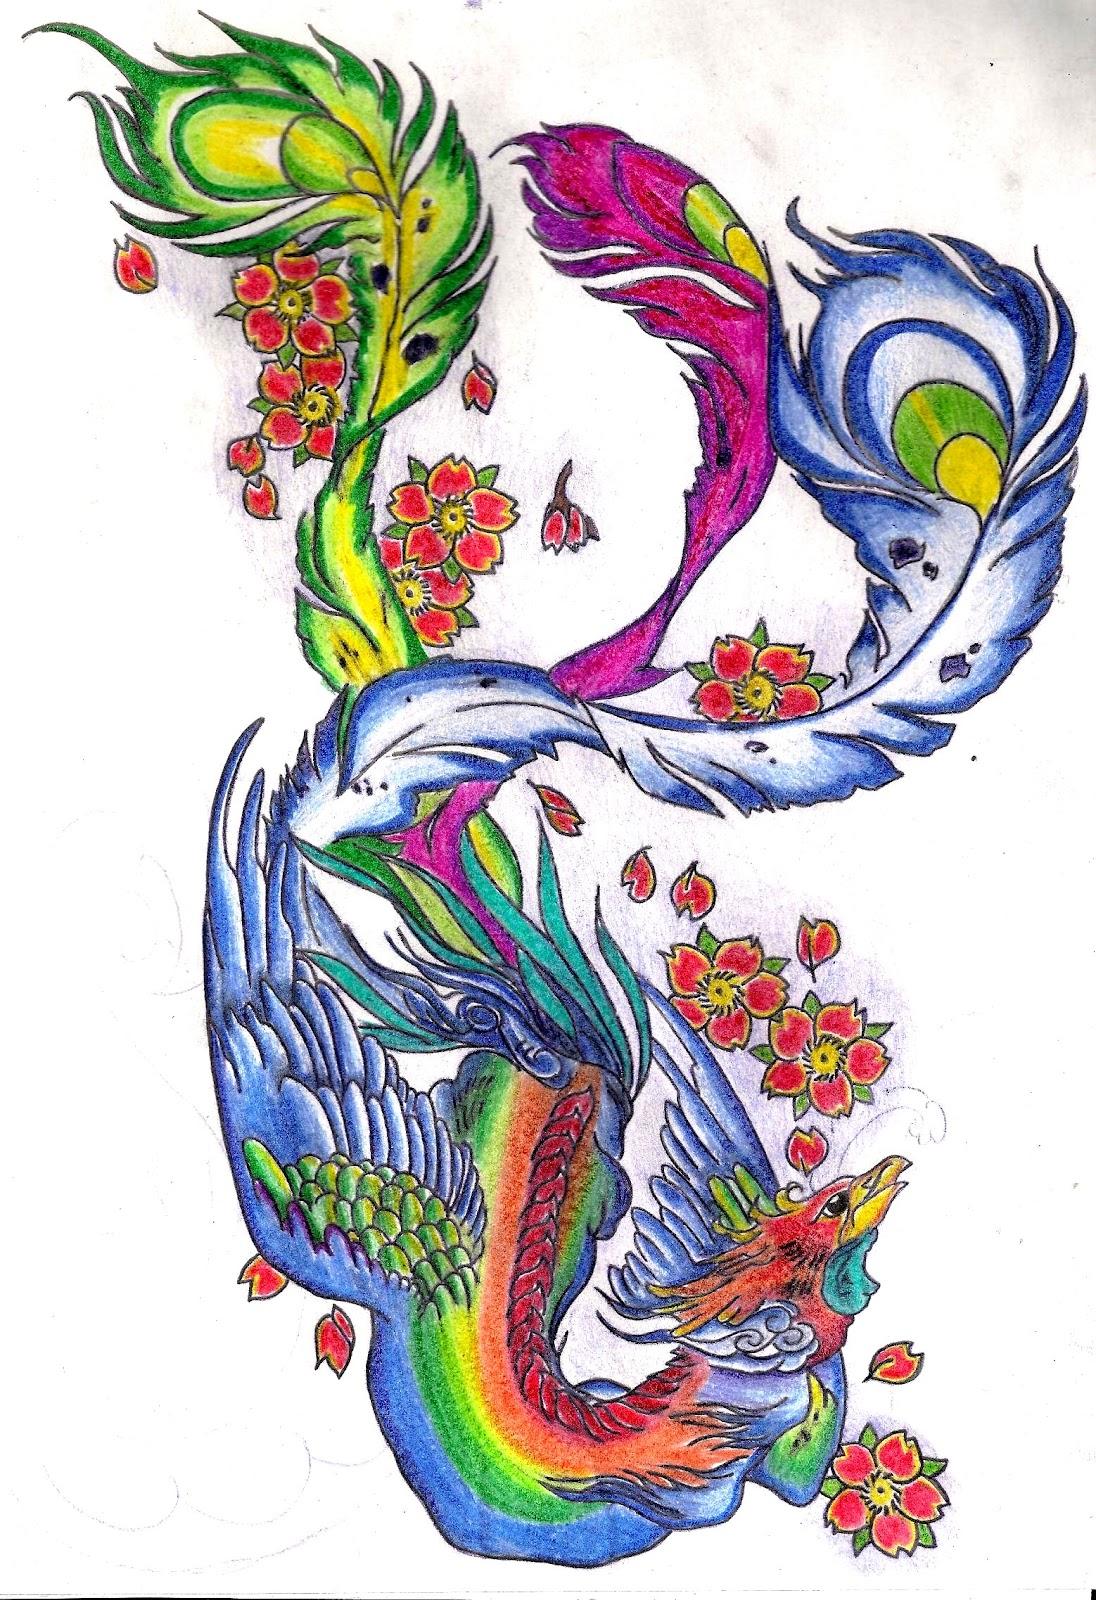 Prince tattoo desenho de fenix colorido for Fenix tribal tattoo